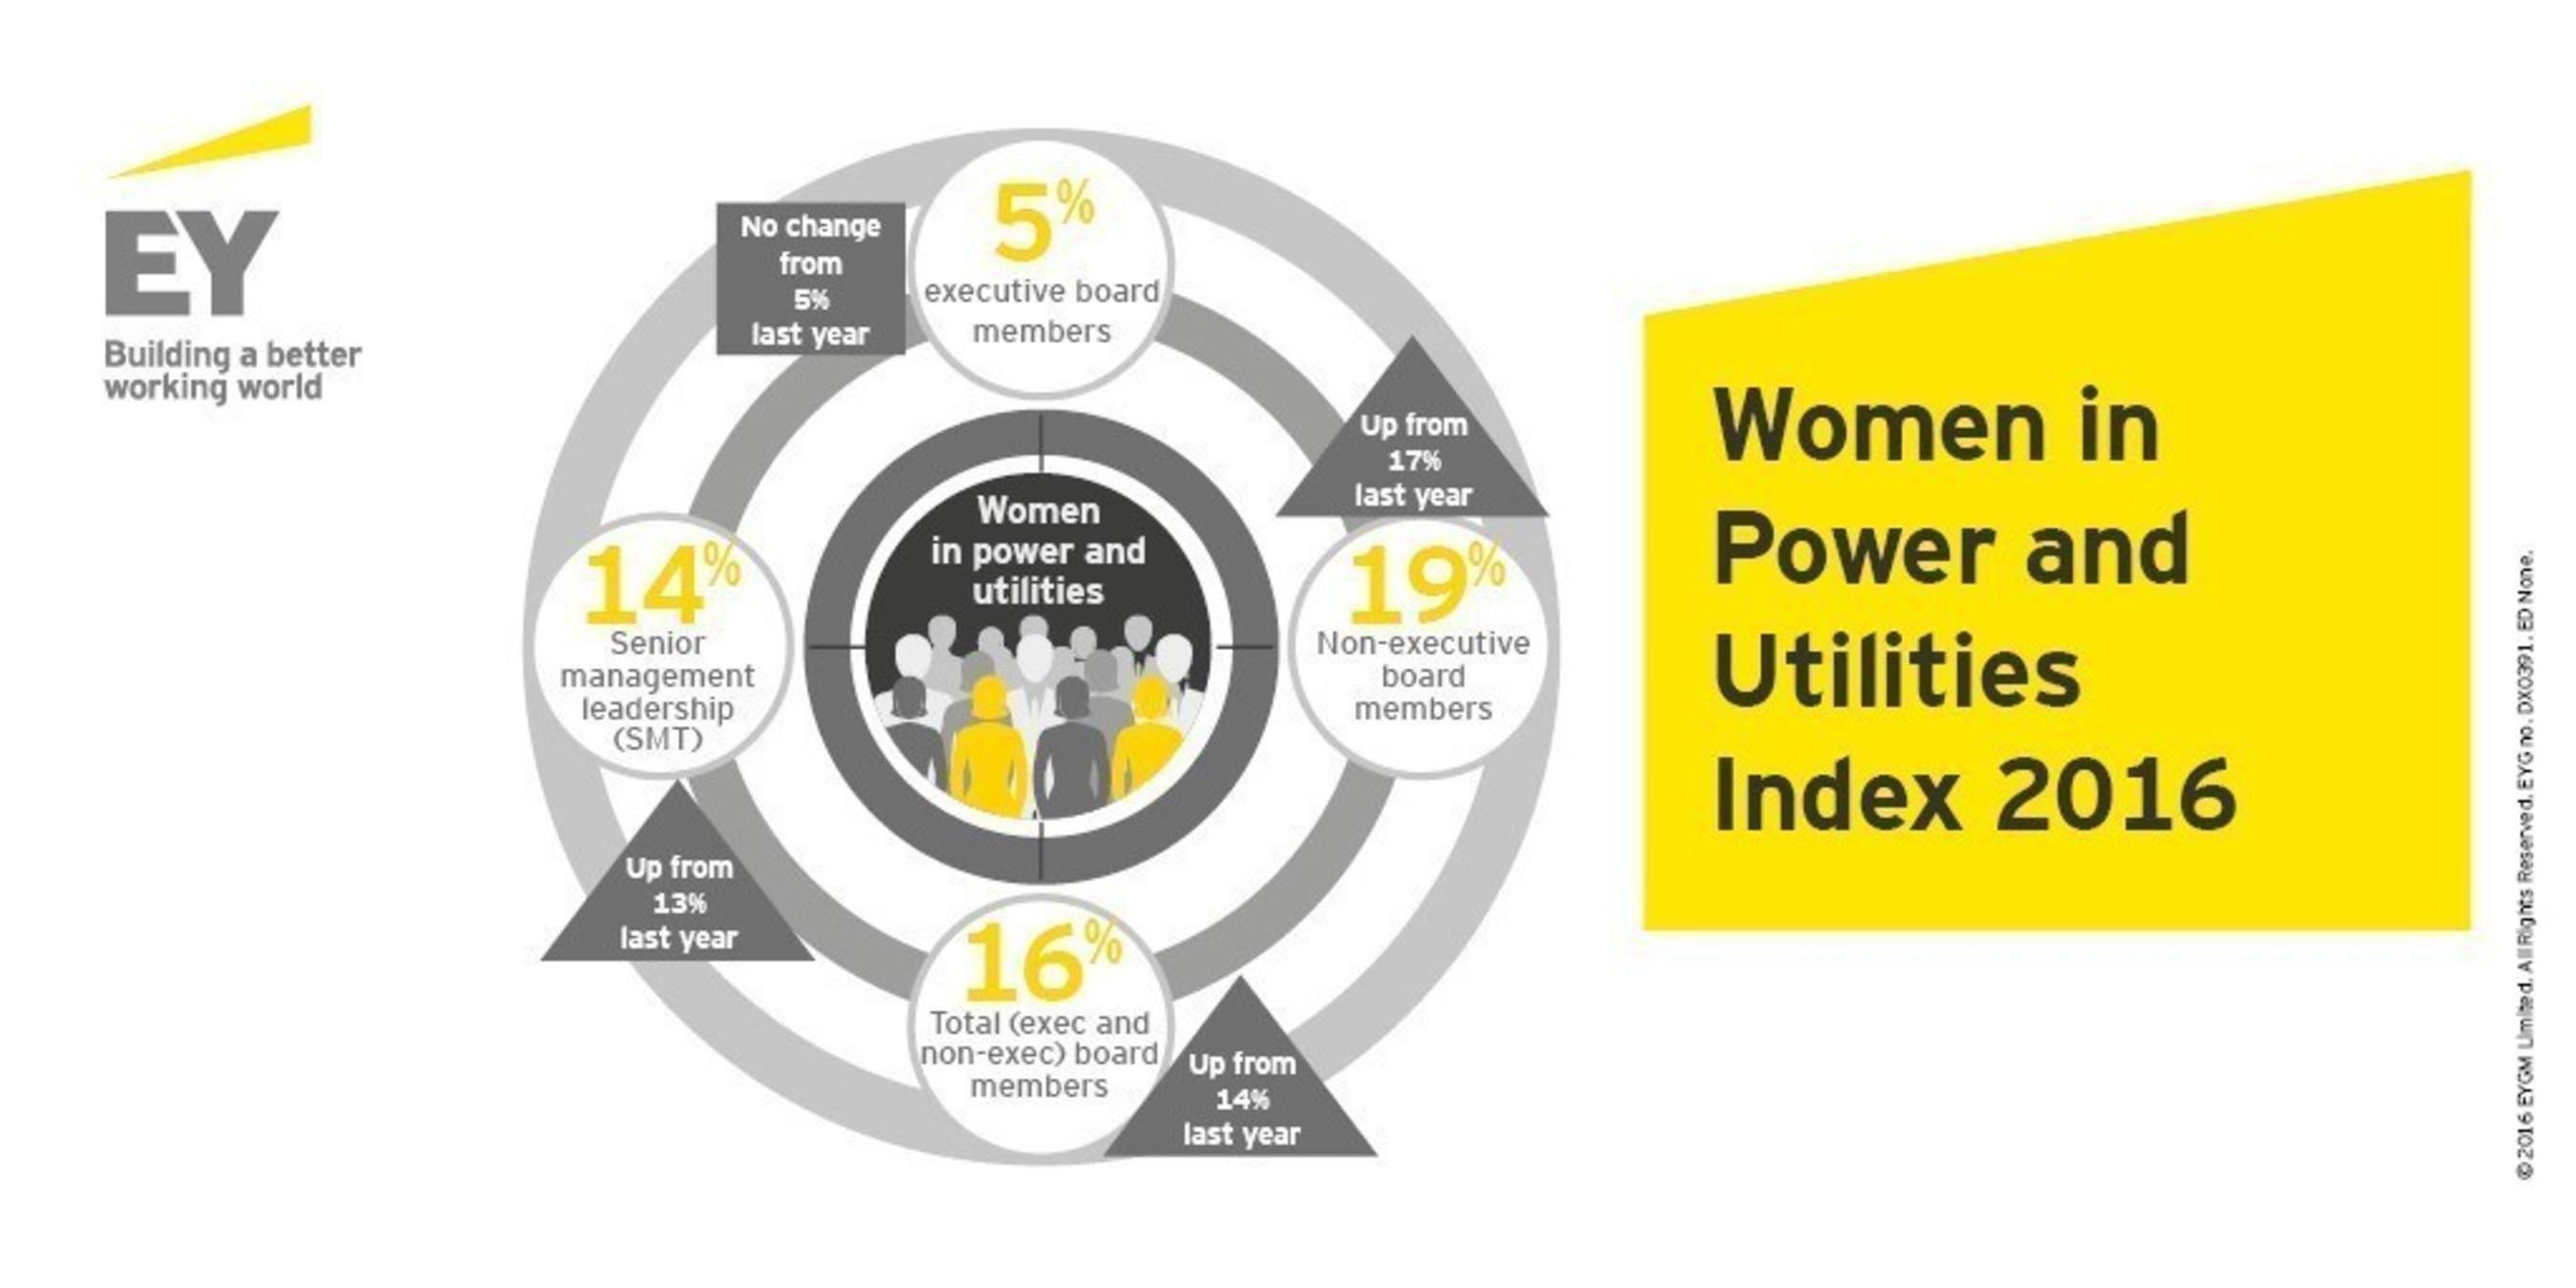 Women in Power and Utilities Index 2016